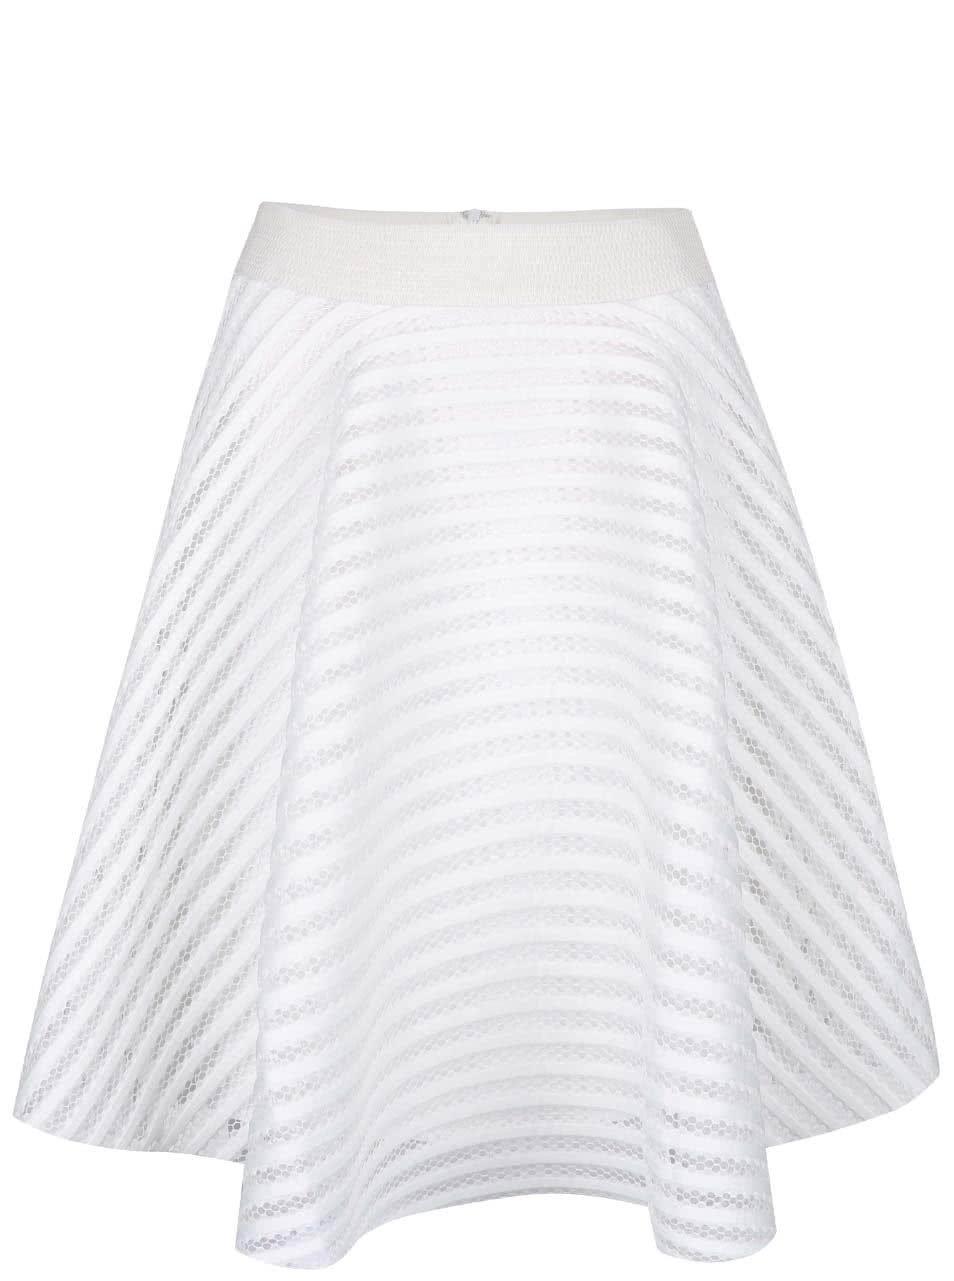 Bílá perforovaná sukně AX Paris